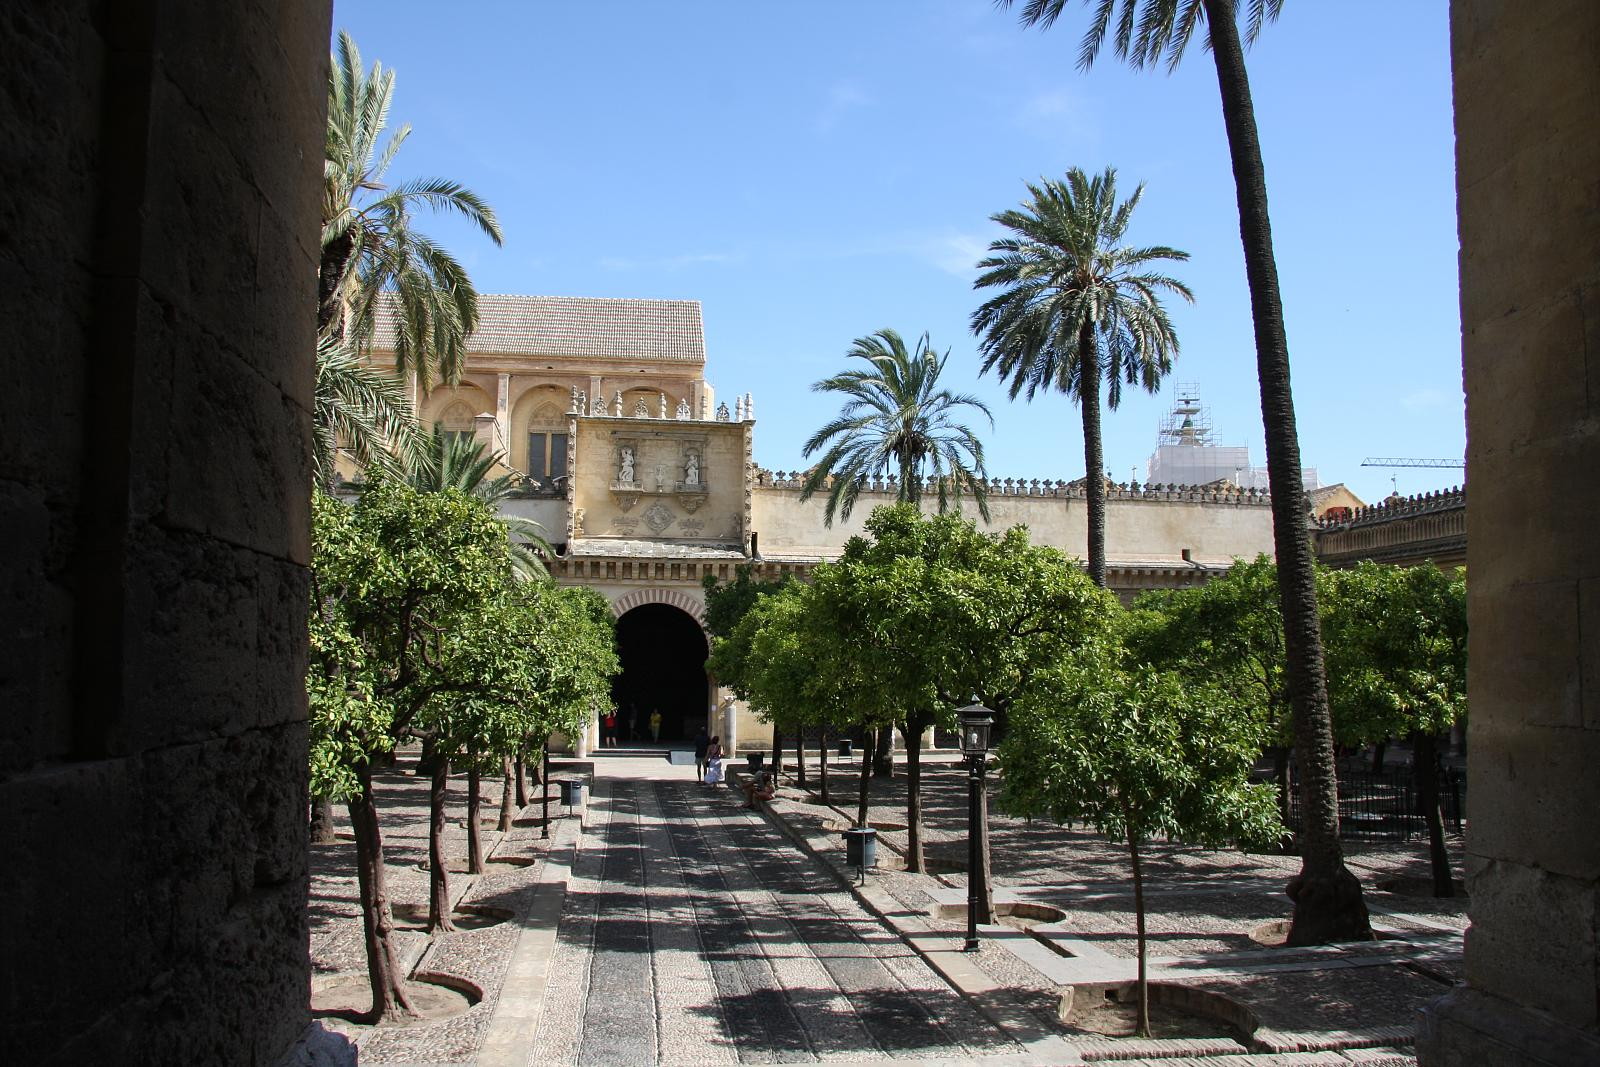 File:Patio de los Naranjos, Mezquita de Córdoba.jpg ...